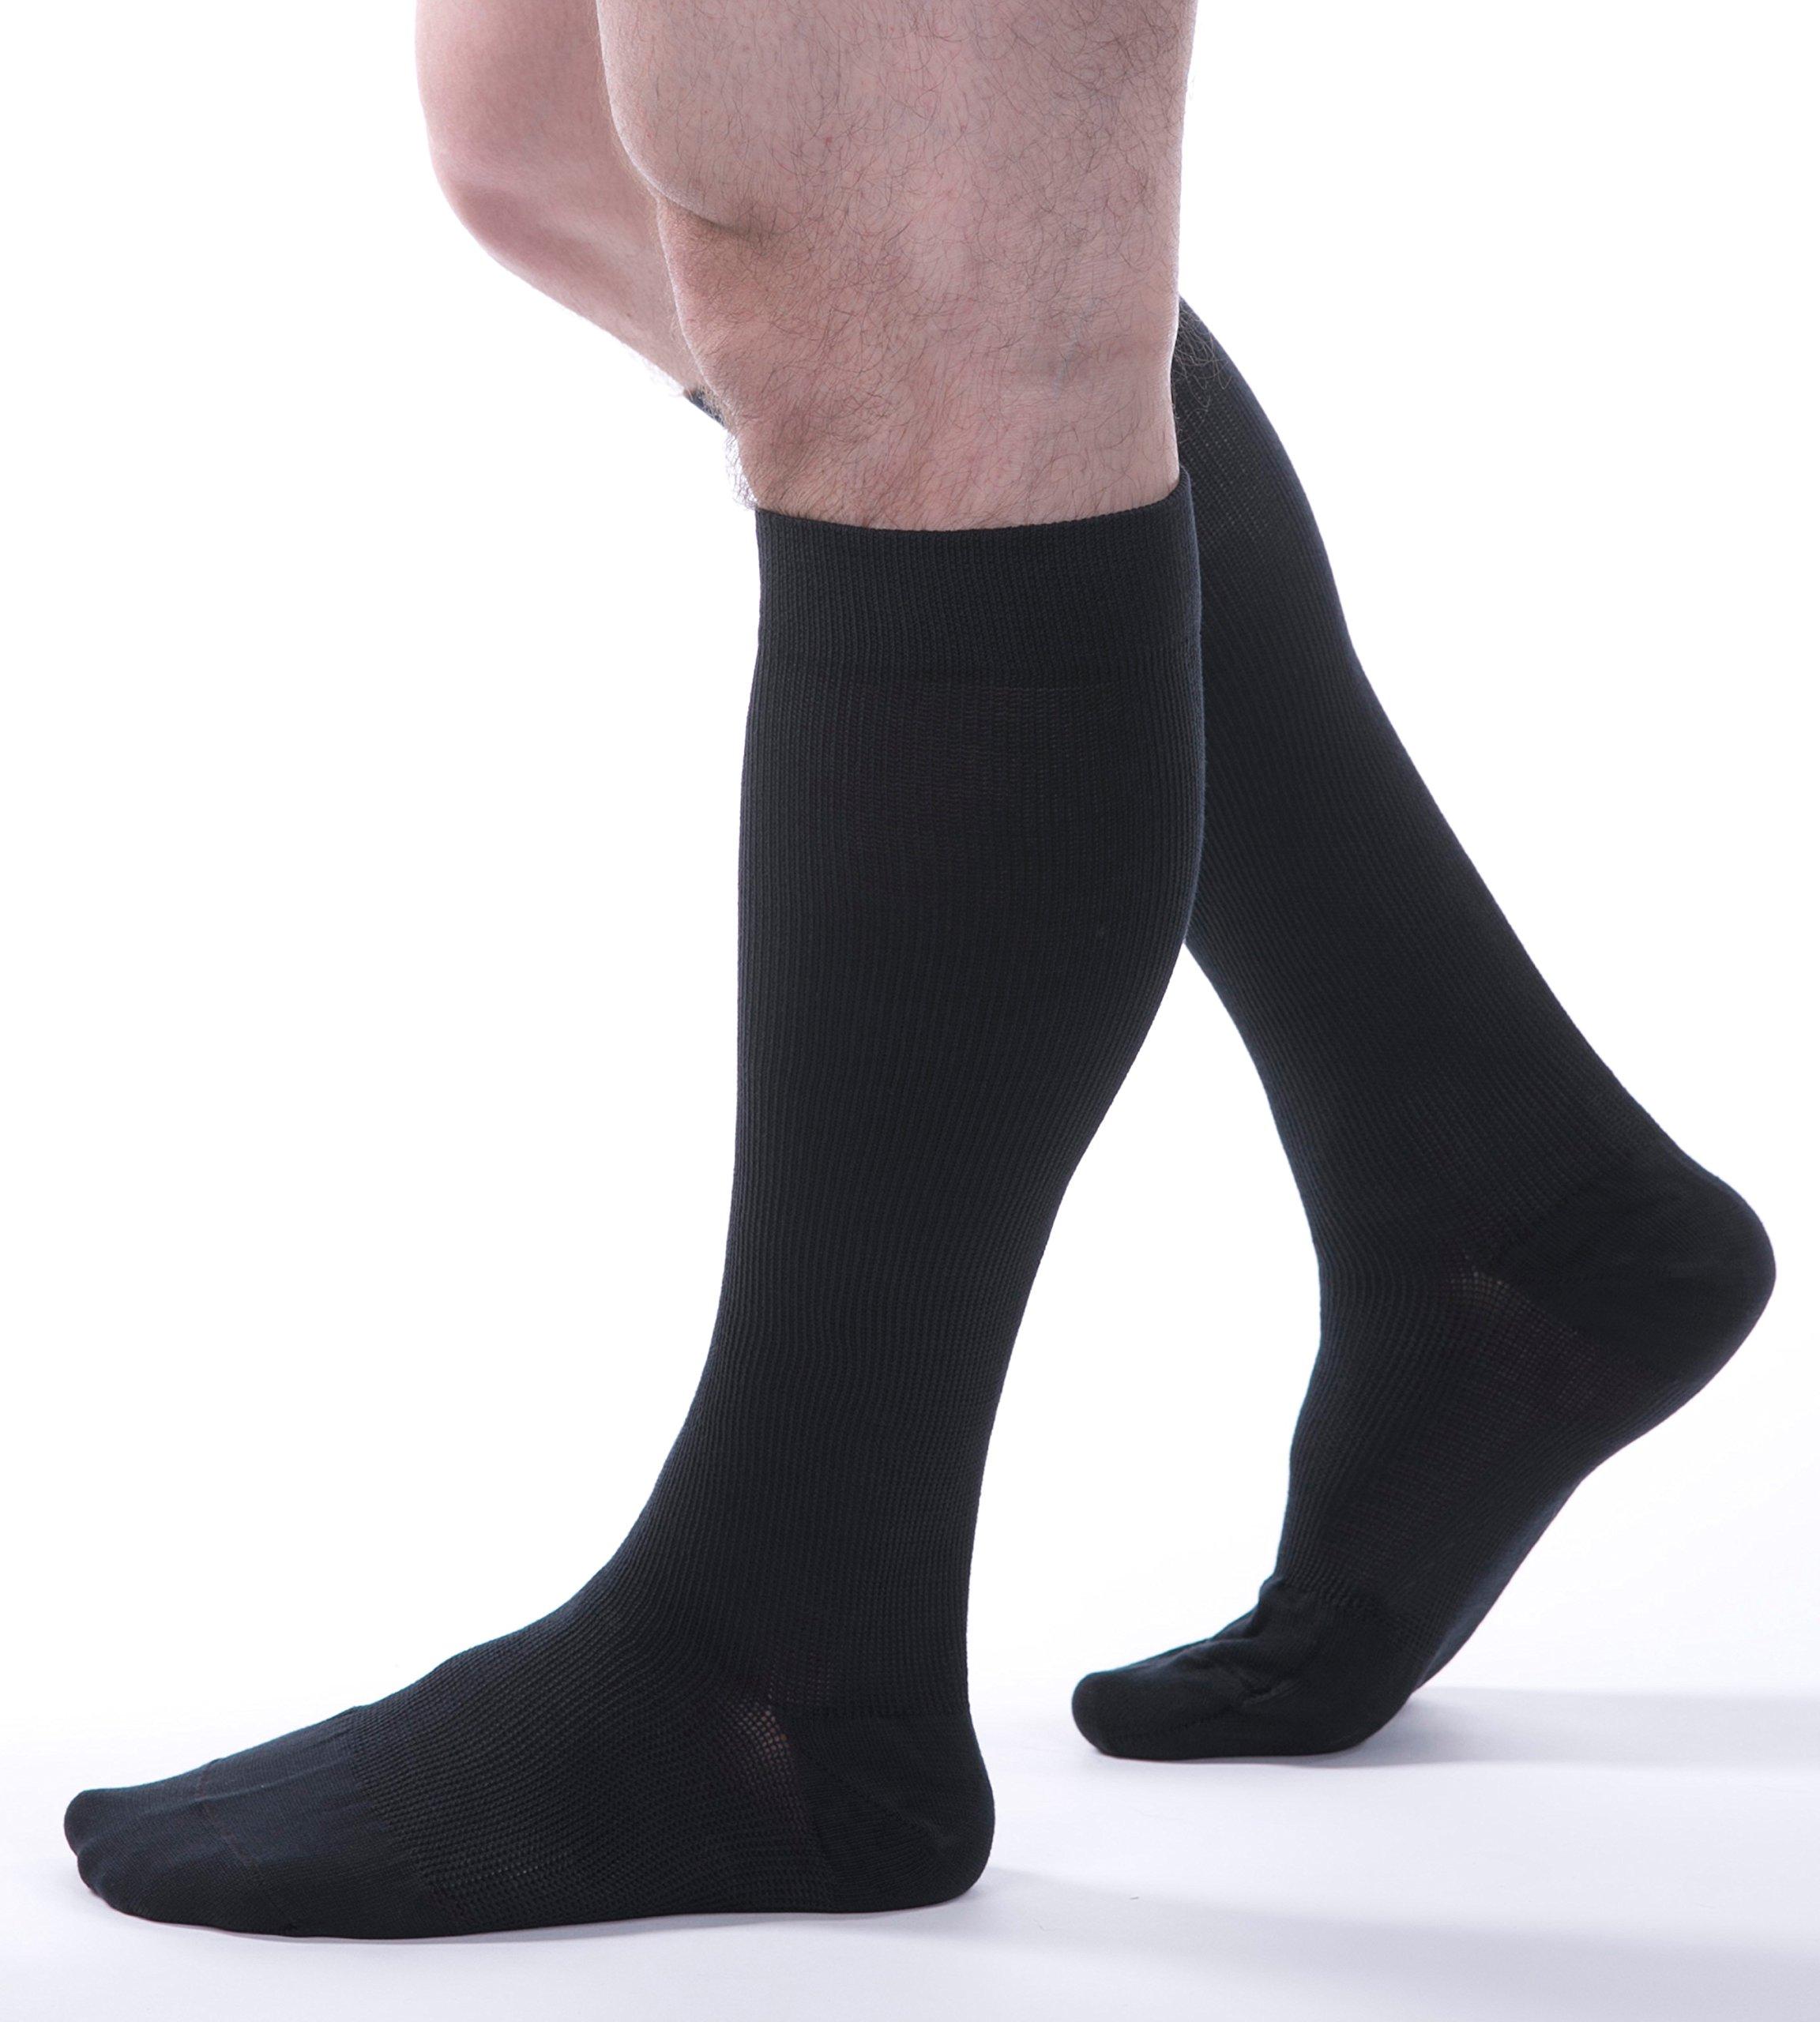 Allegro Mens Cotton Knee High 20-30mmHg - Item# 111 (Black-Large)